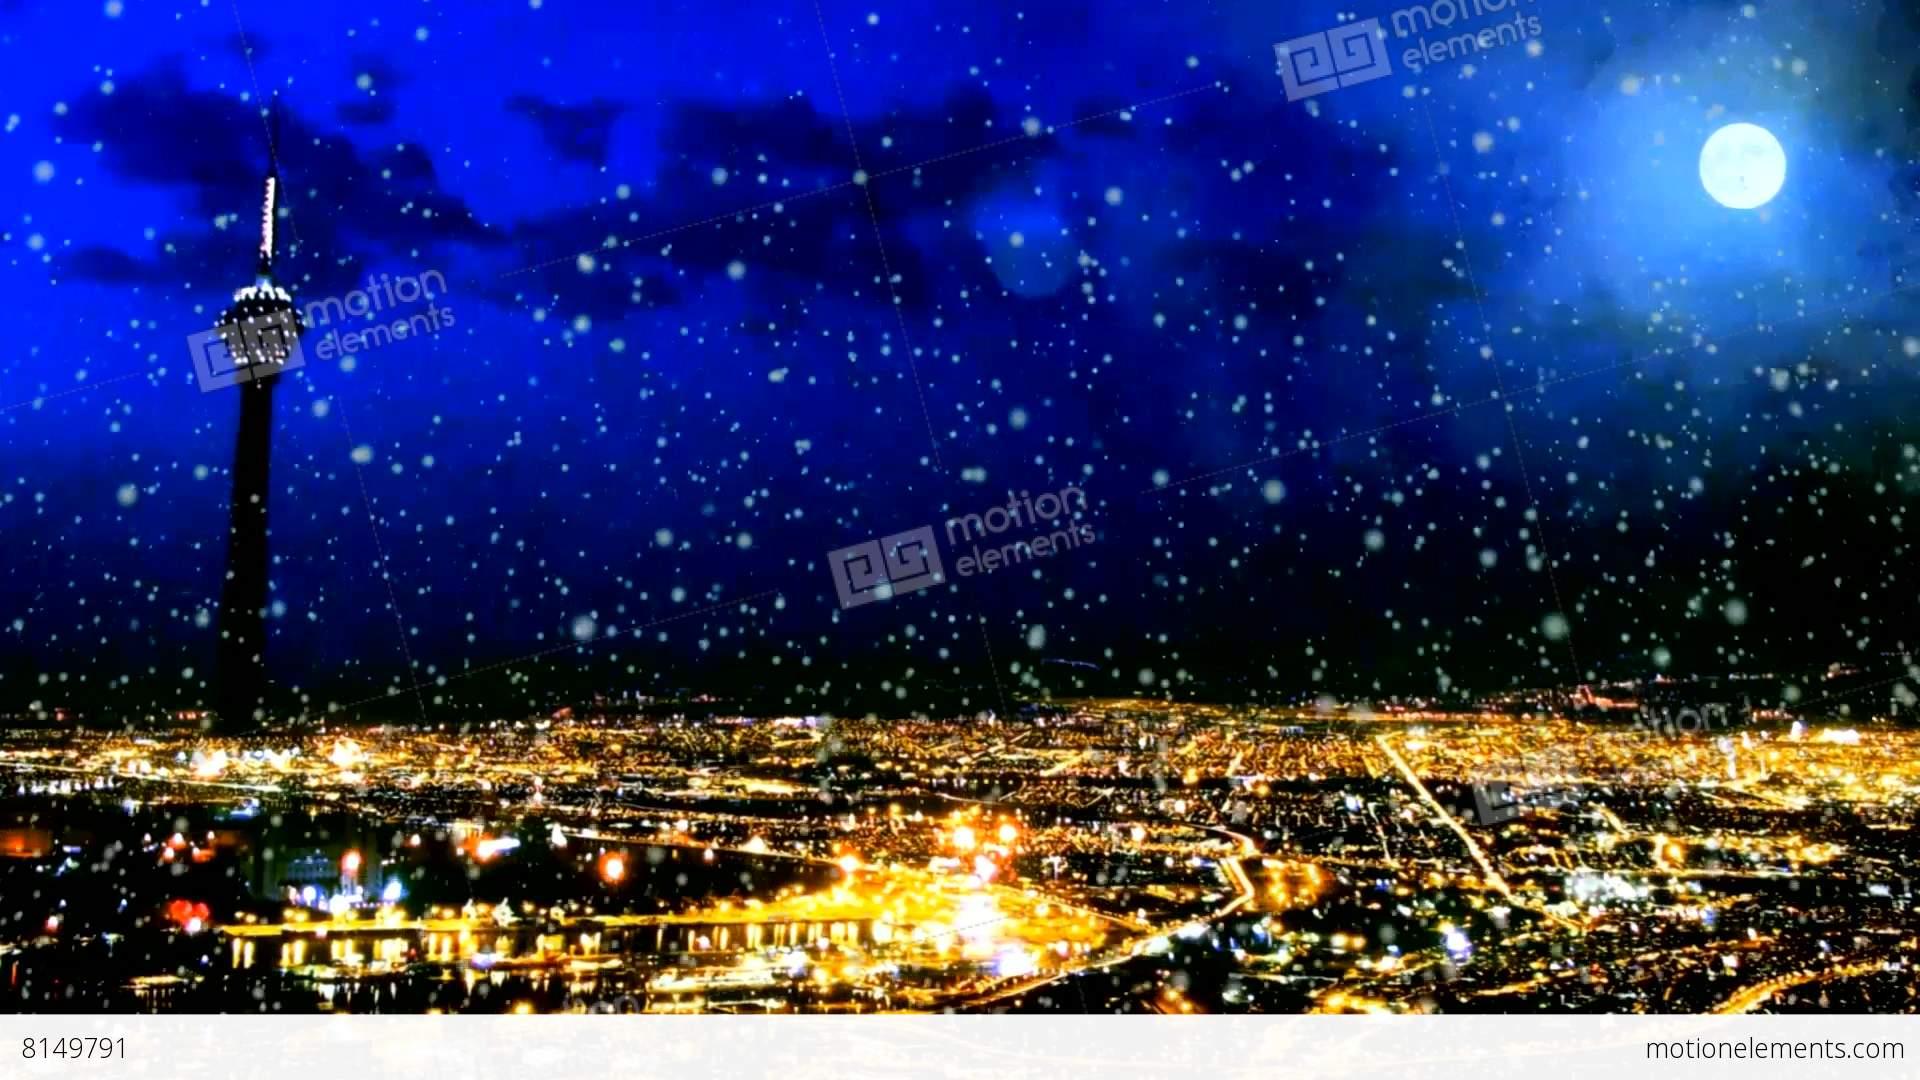 Golden night city in winter stock animation 8149791 for Golden night